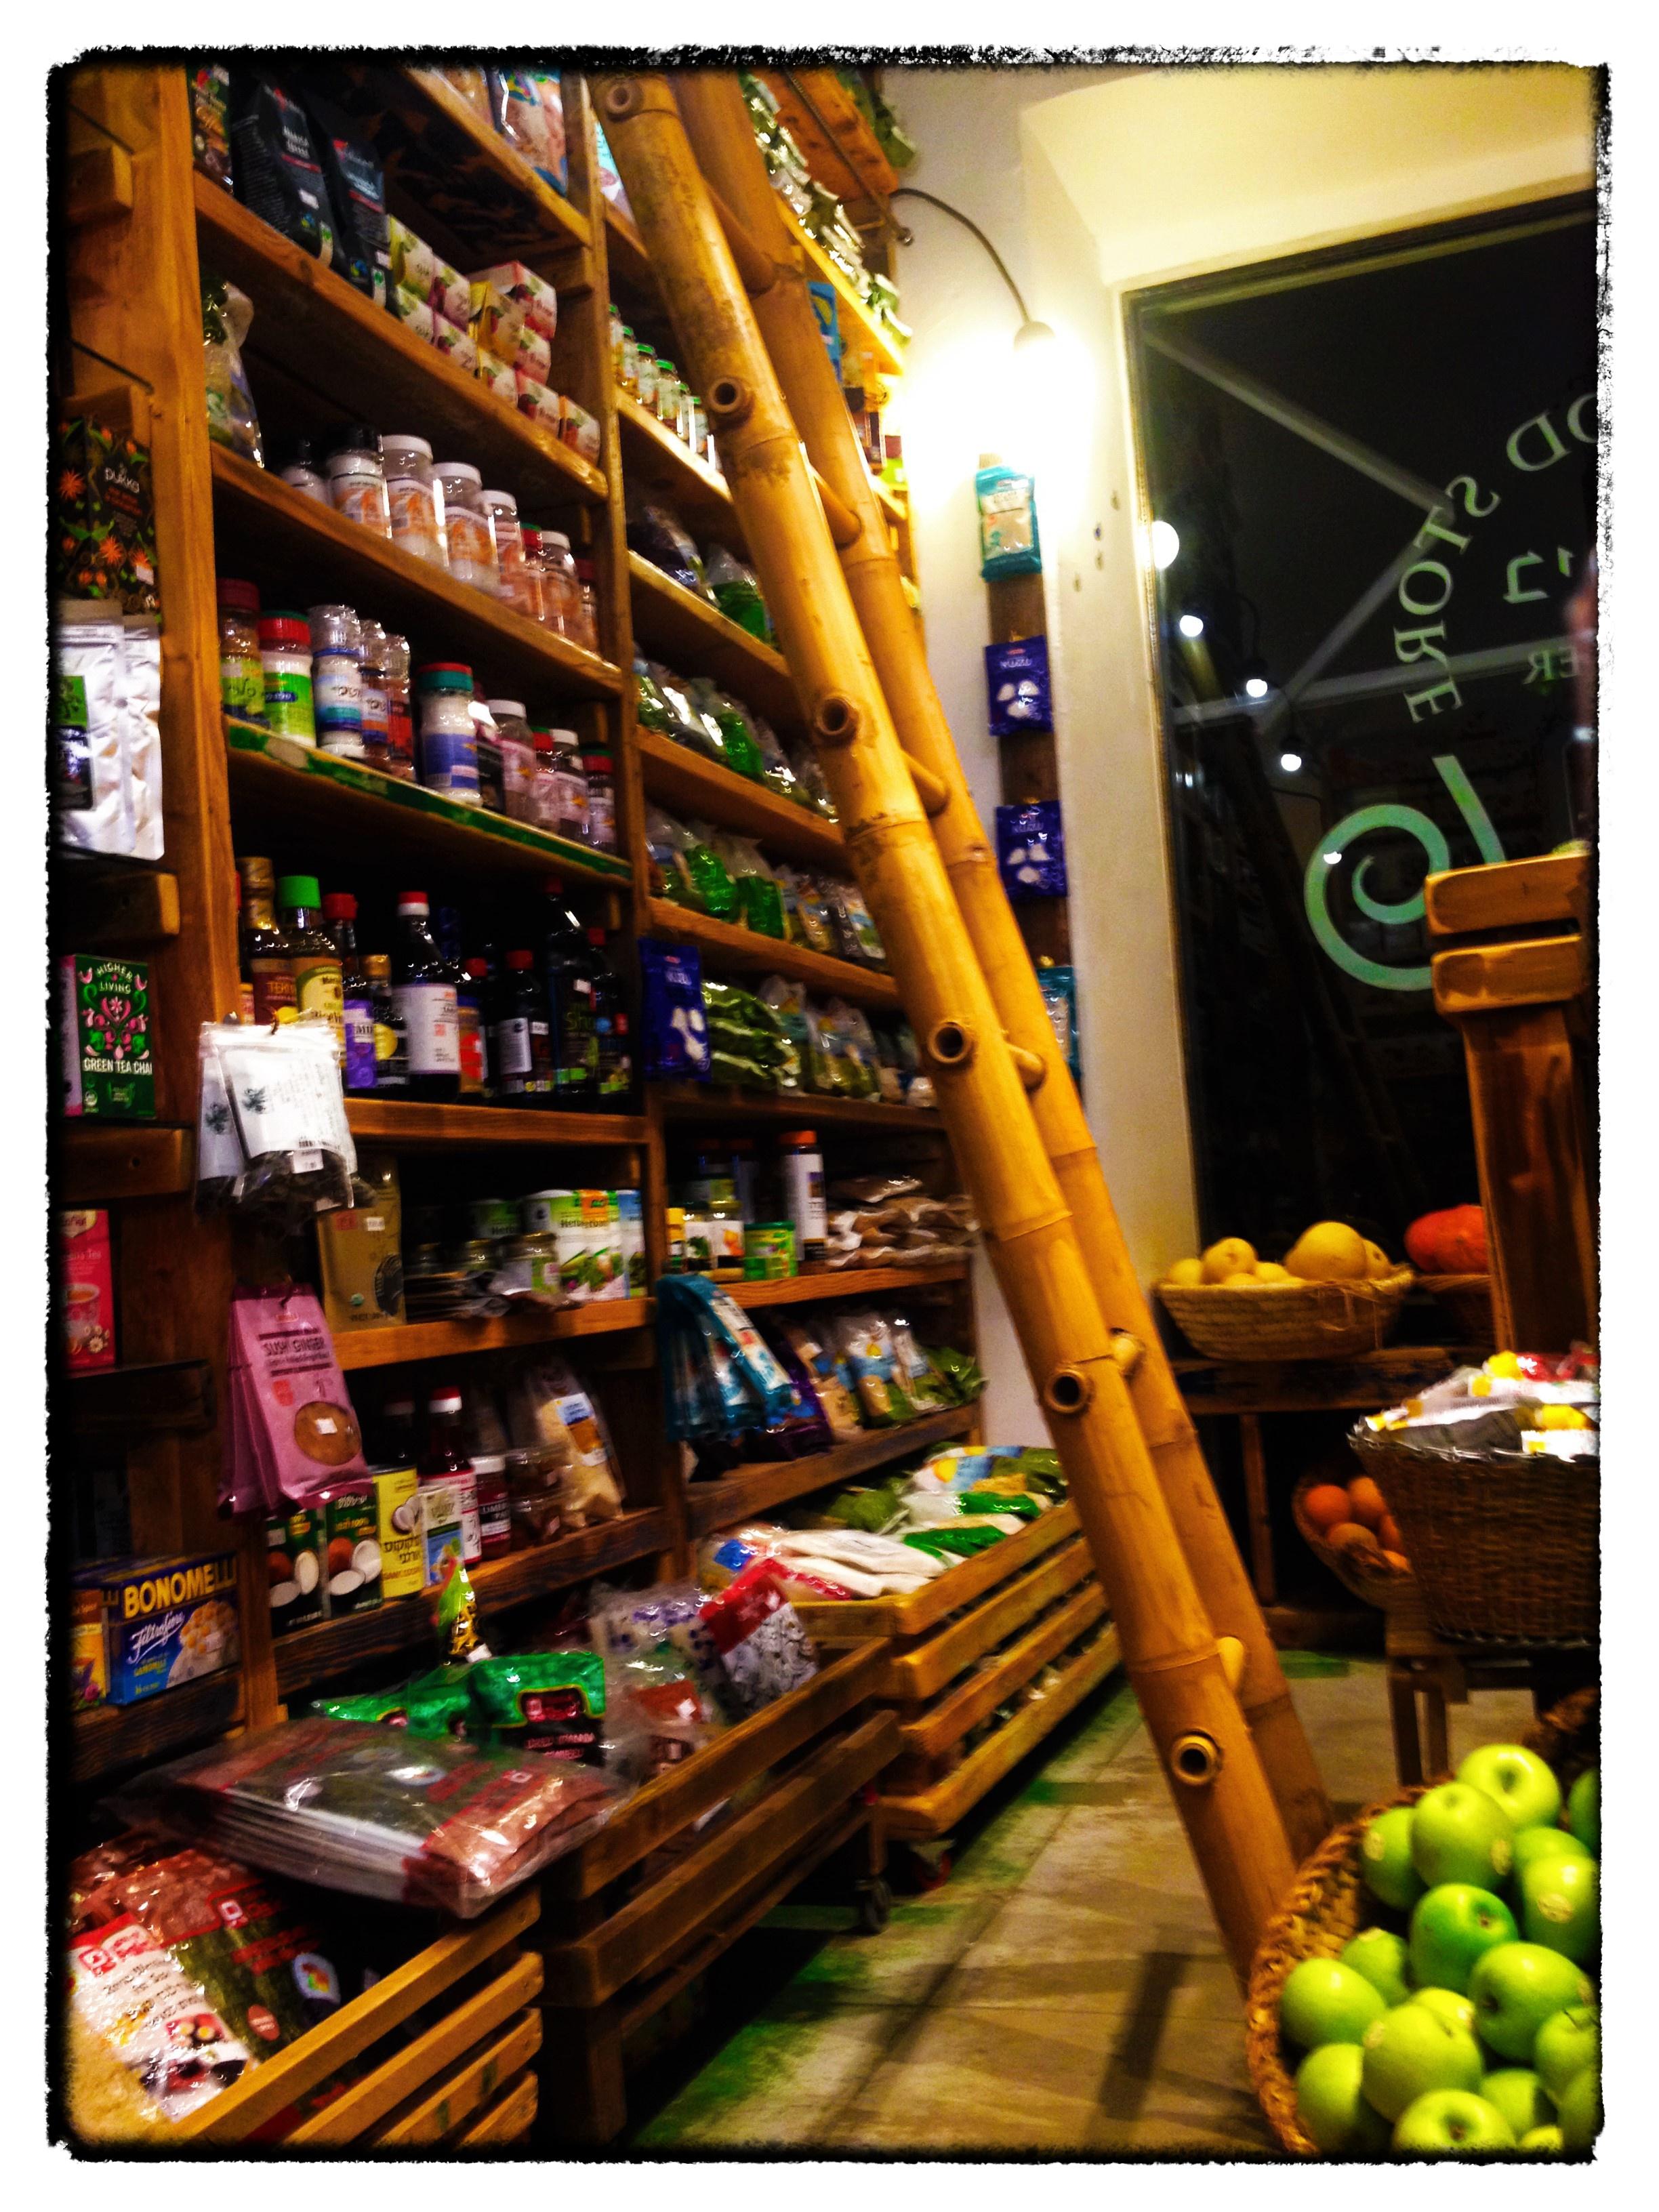 Sturdy Bamboo Ladder